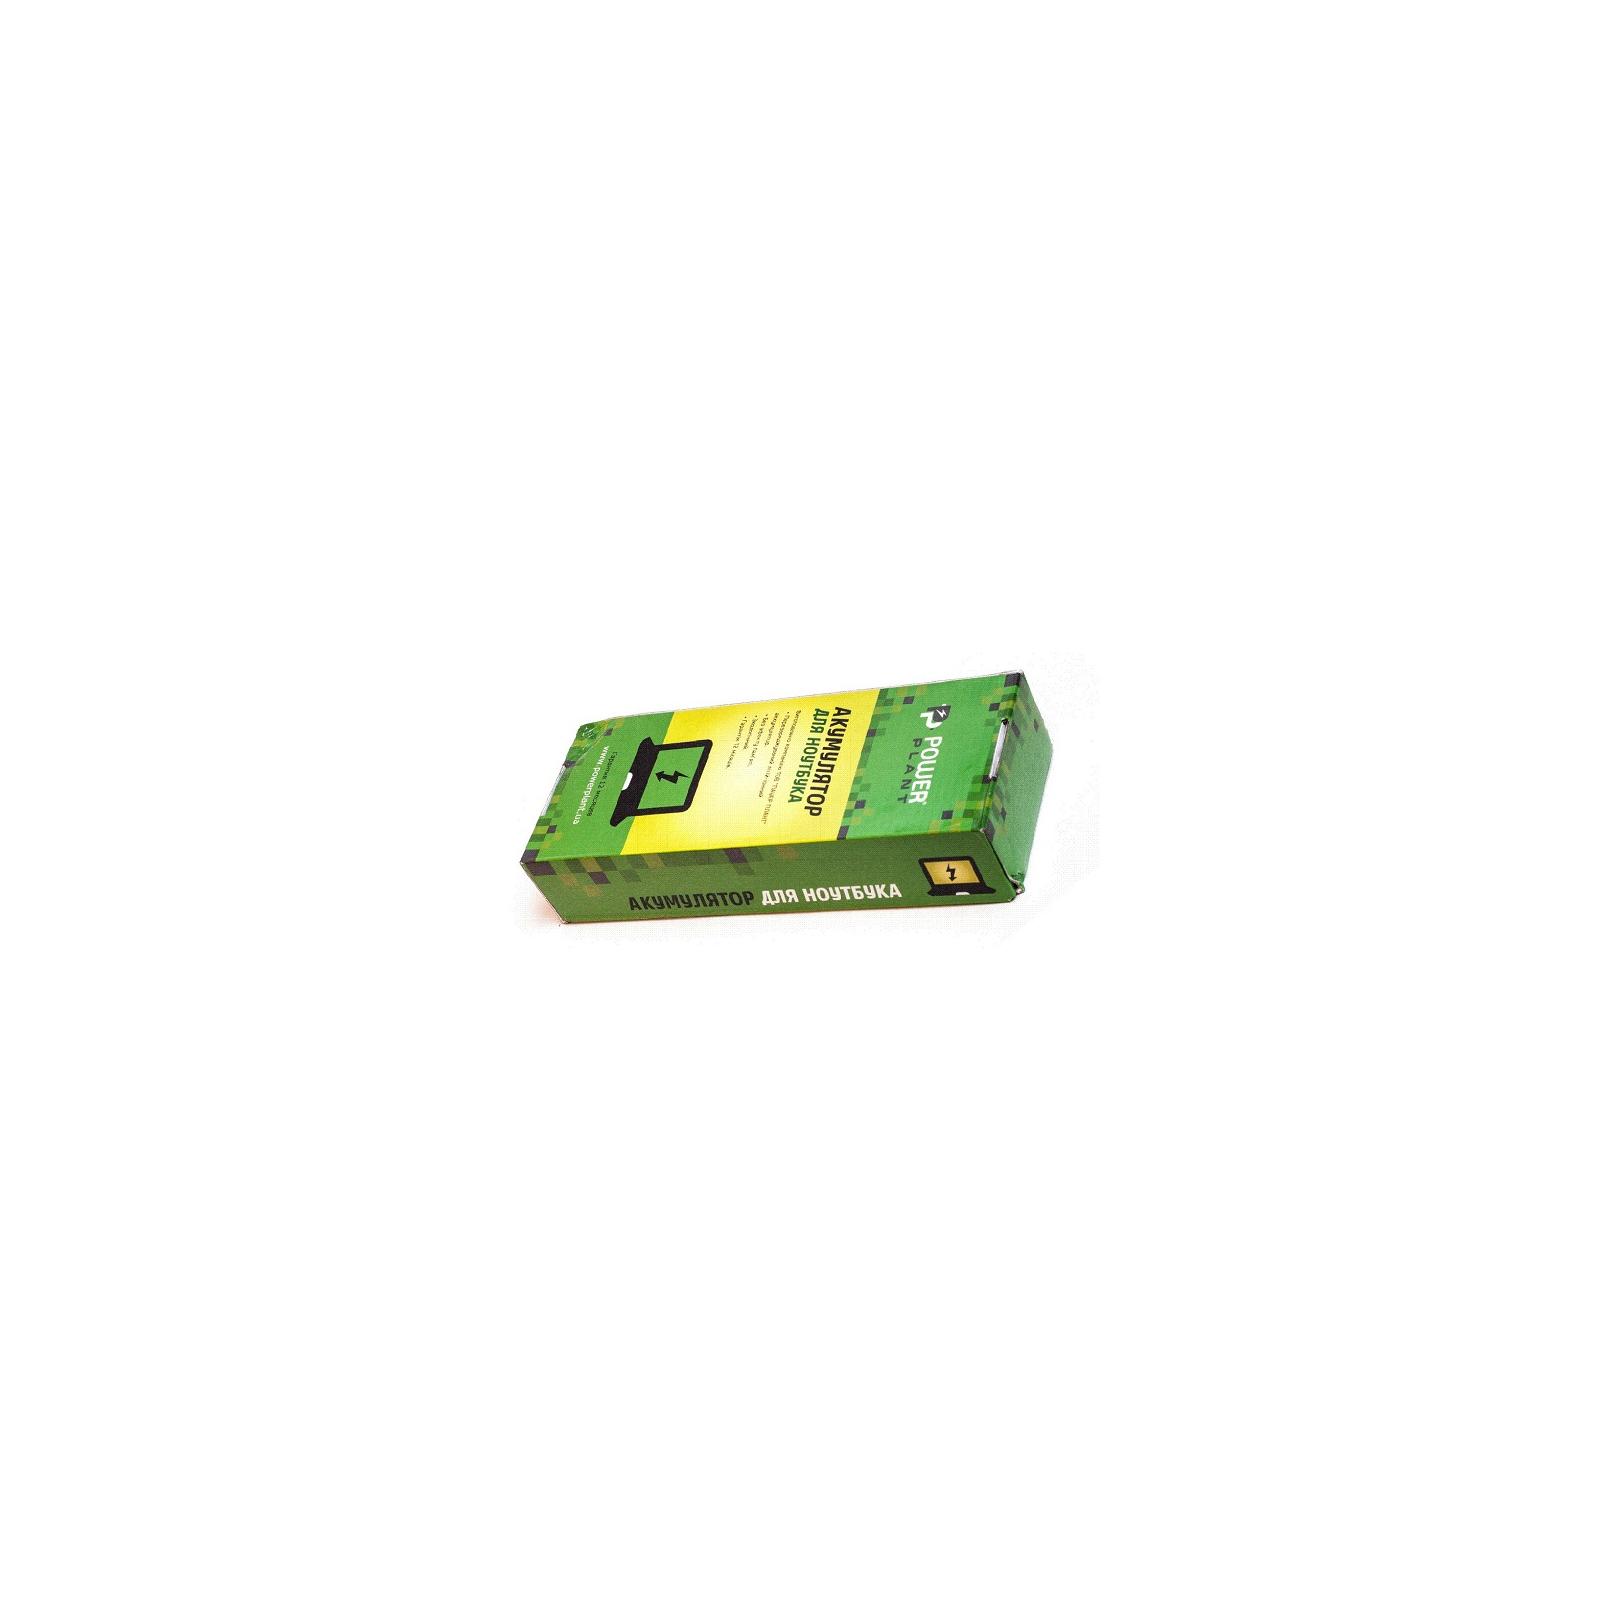 Аккумулятор для ноутбука ACER Aspire 5230 (AS07B41, AR5923LH) 11.1V 5200mAh PowerPlant (NB00000196) изображение 3